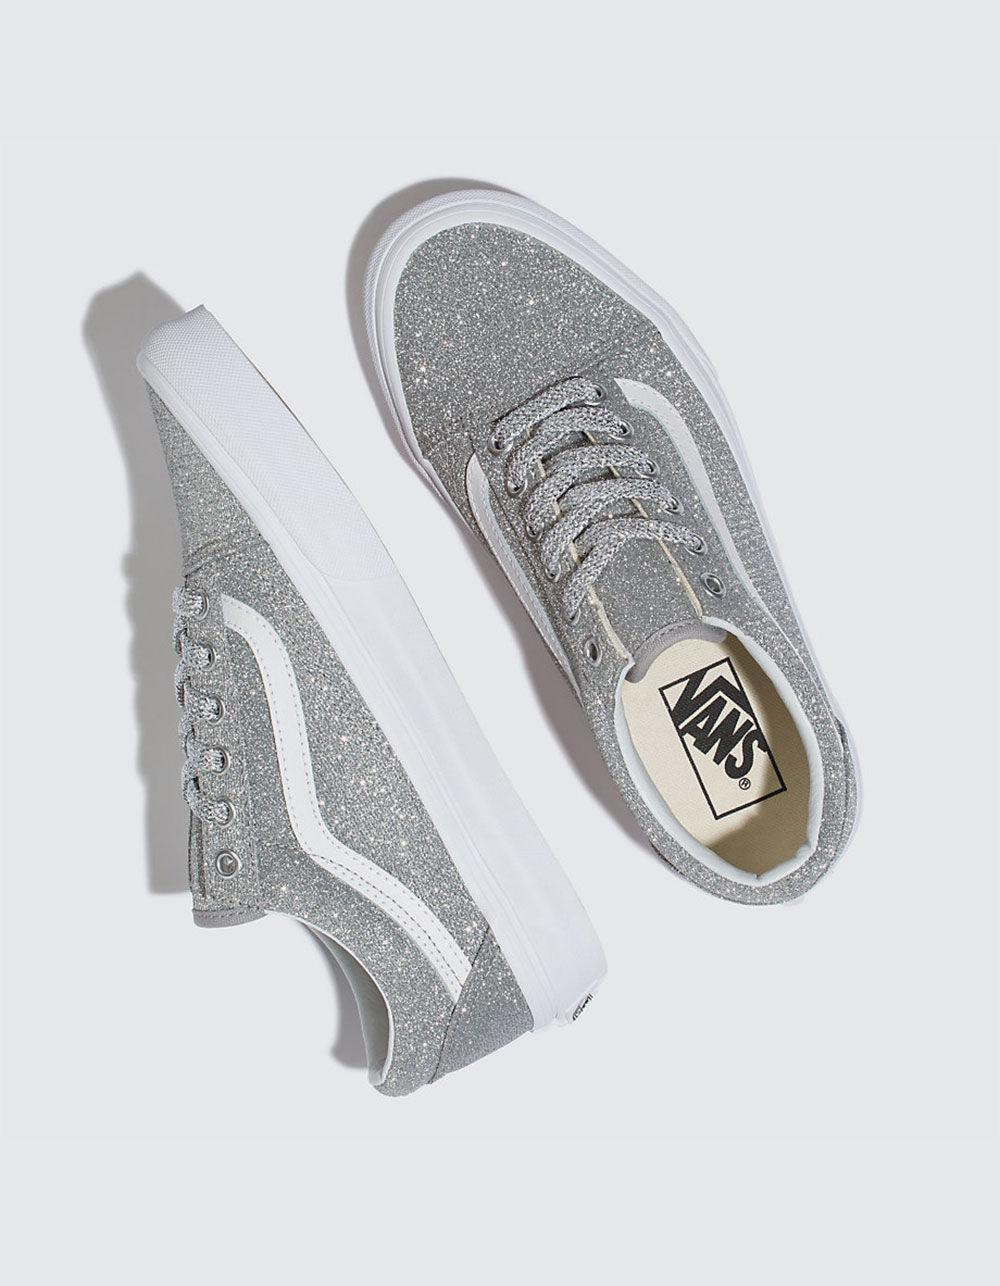 6bdbcecf01fb Lyst - Vans Old Skool Lurex Silver   True White Womens Shoes in Metallic